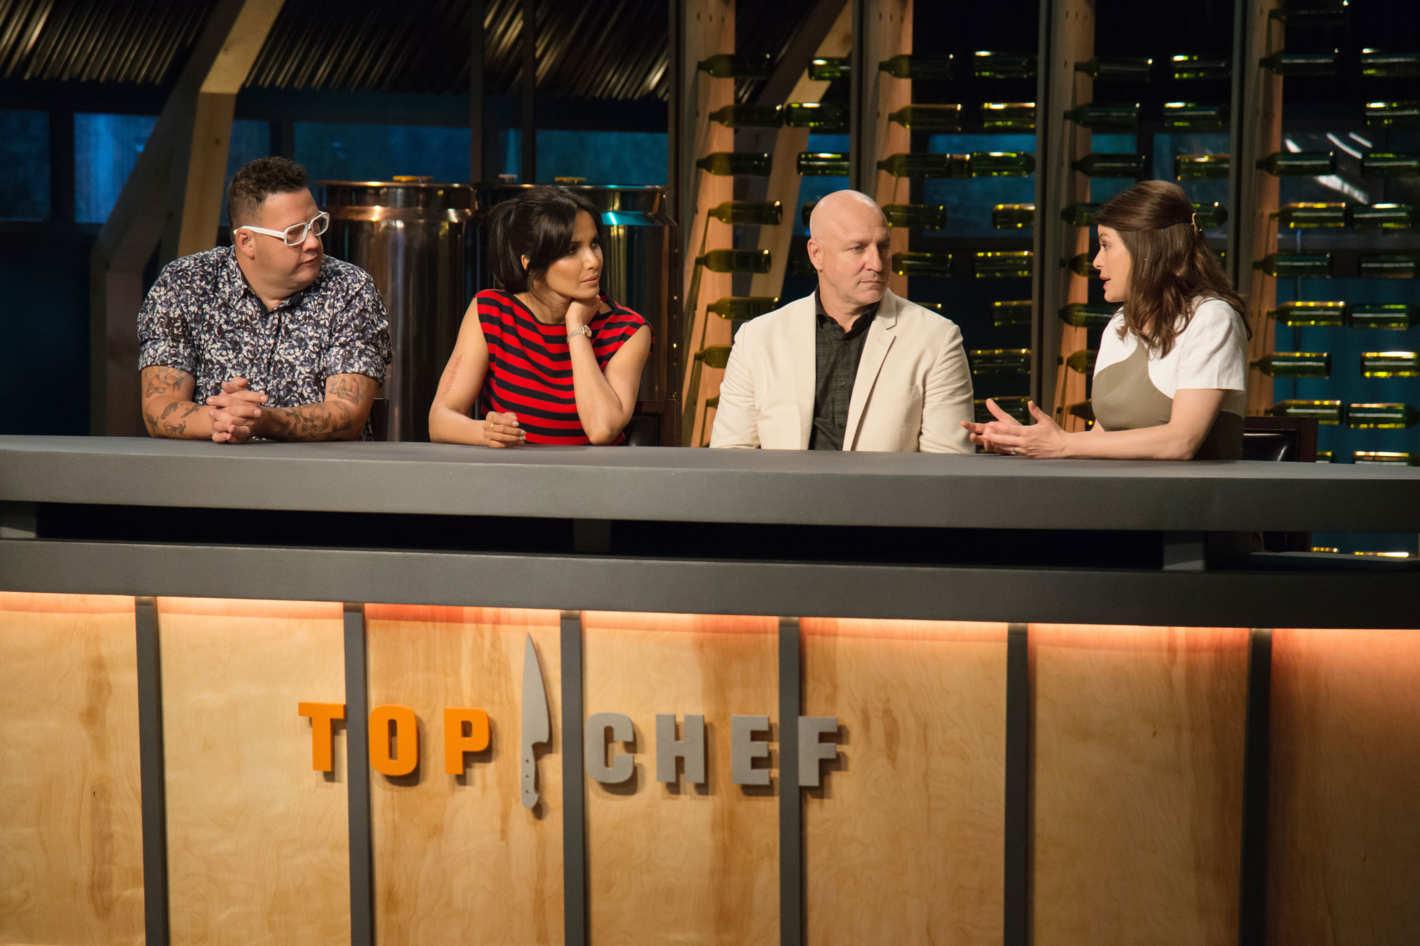 08-top-chef-1501-1.w710.h473.2x.jpg